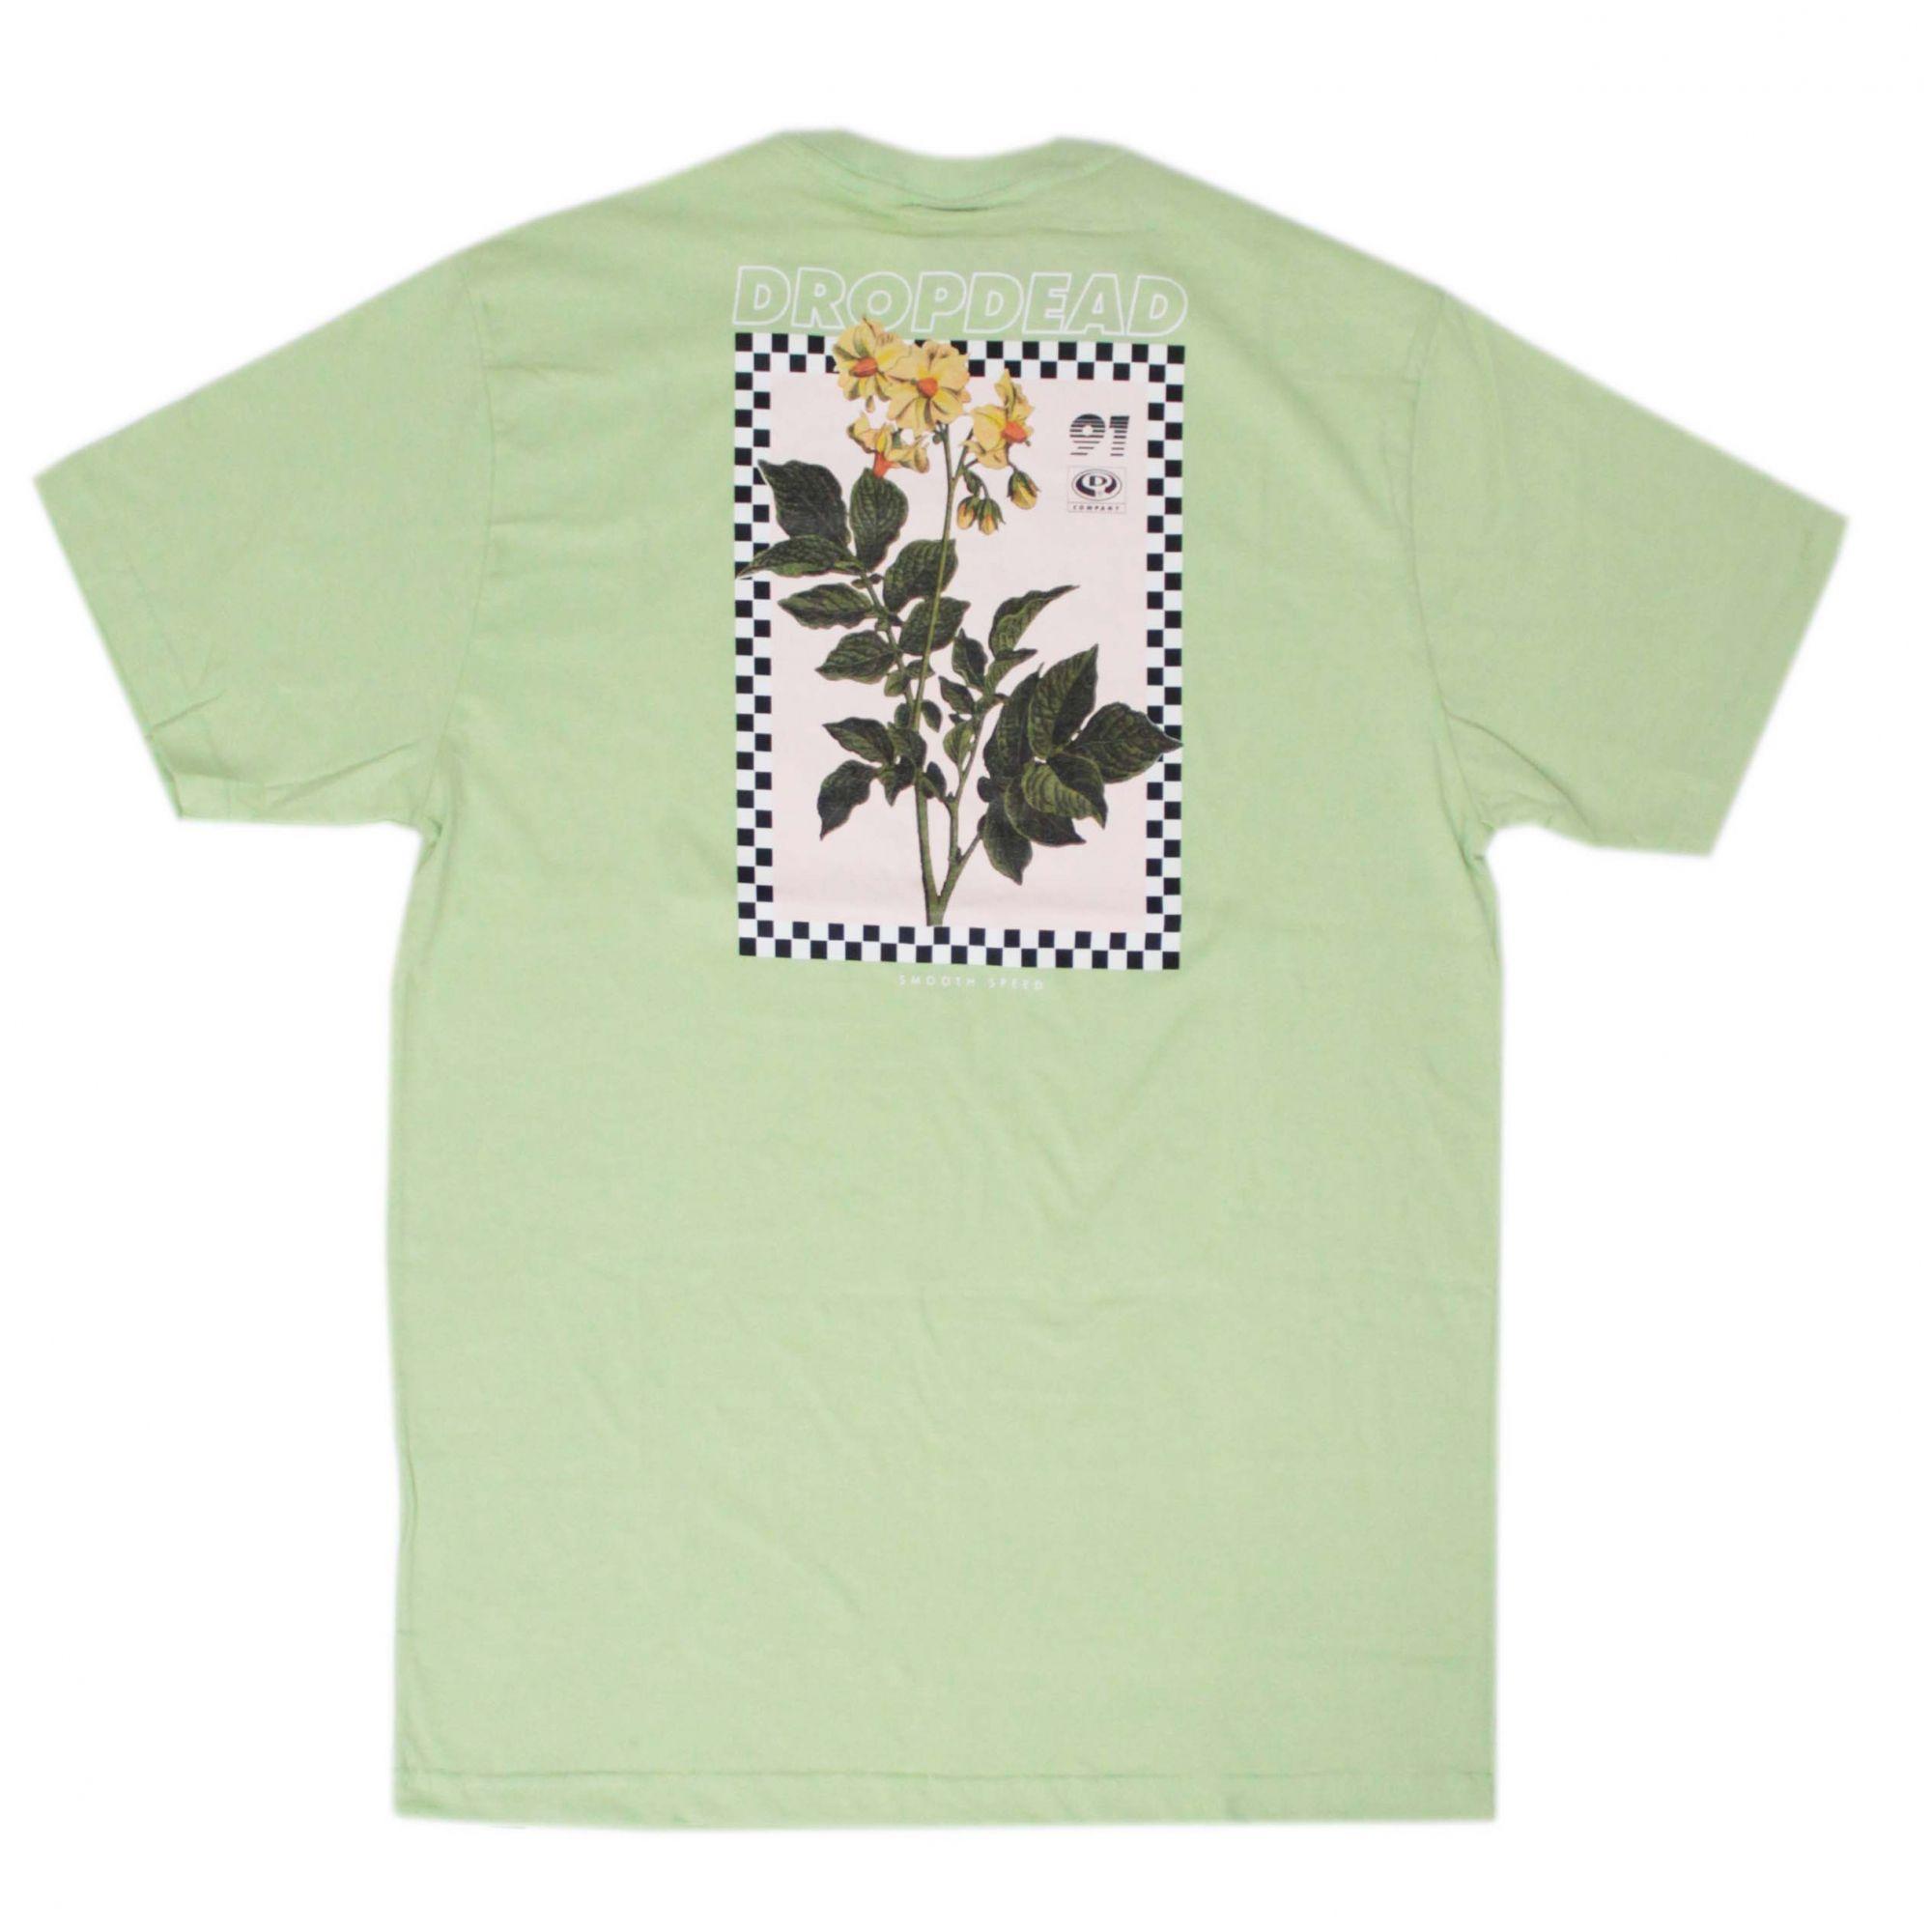 Camiseta Drop Dead Smooth Speed Verde Claro